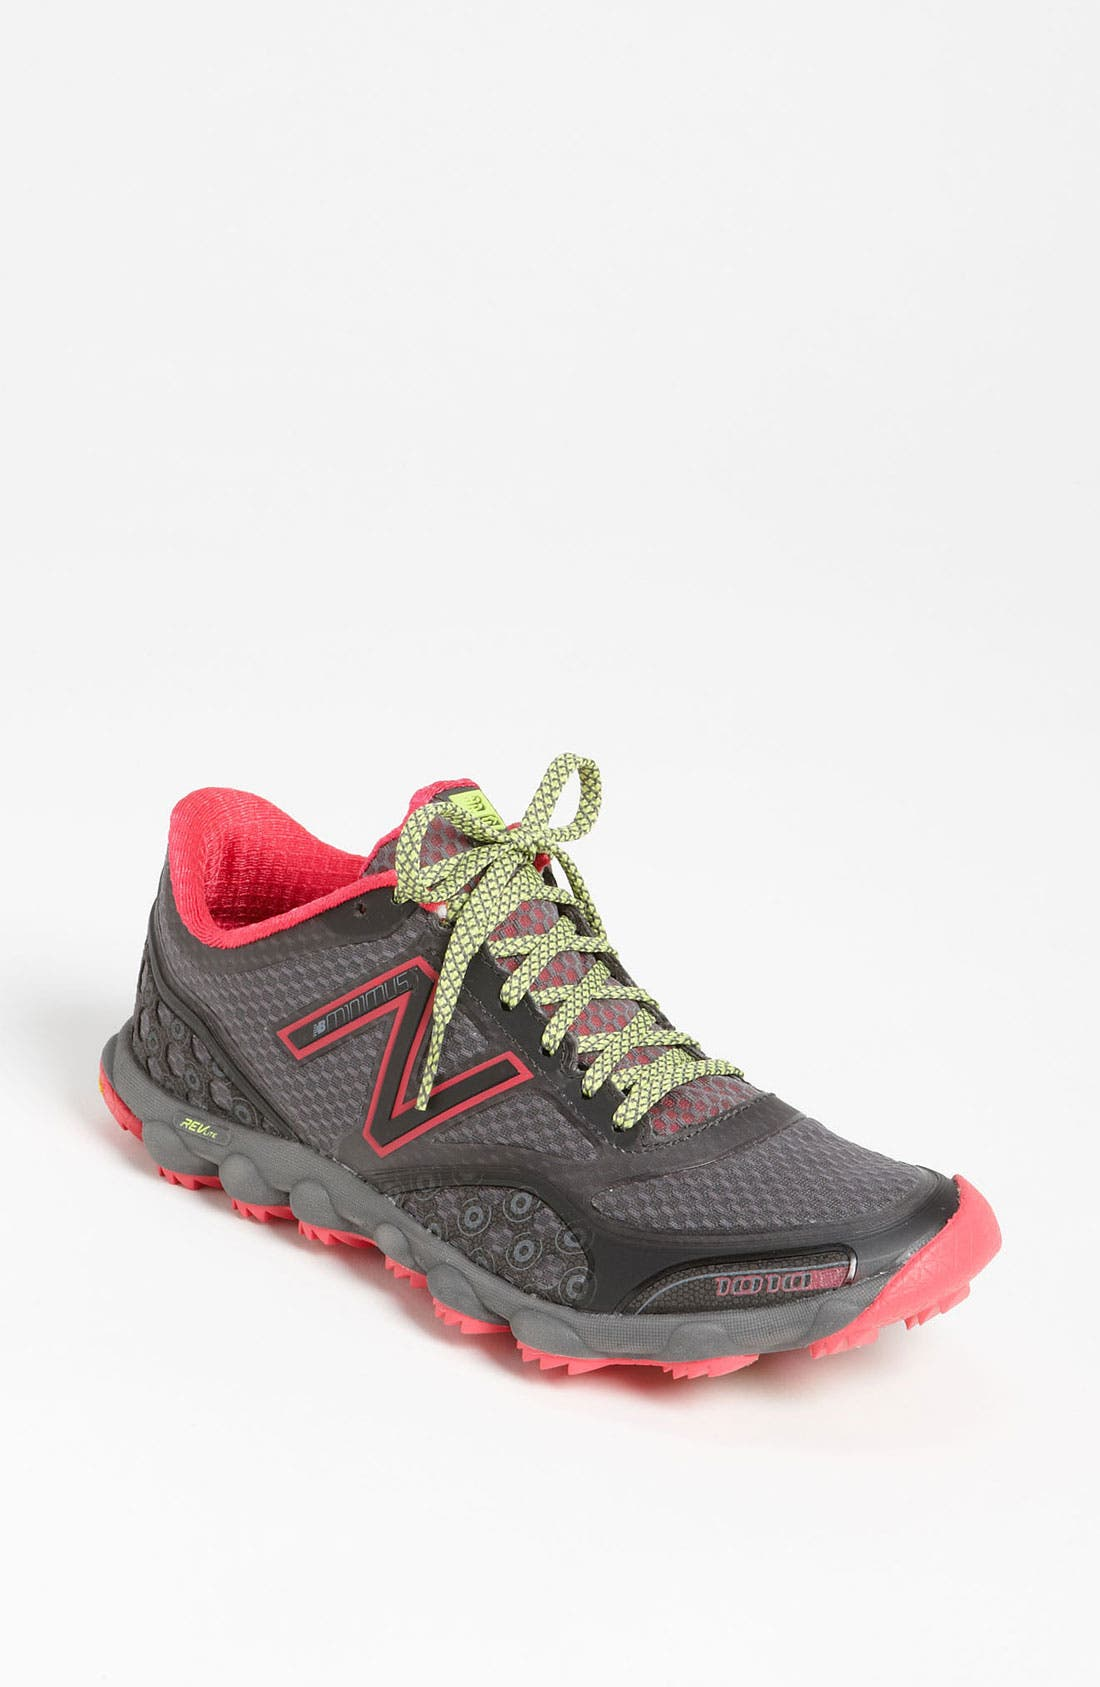 Main Image - New Balance '1010 Minimus Trail' Training Shoe (Women) (Regular Retail Price: $109.95)